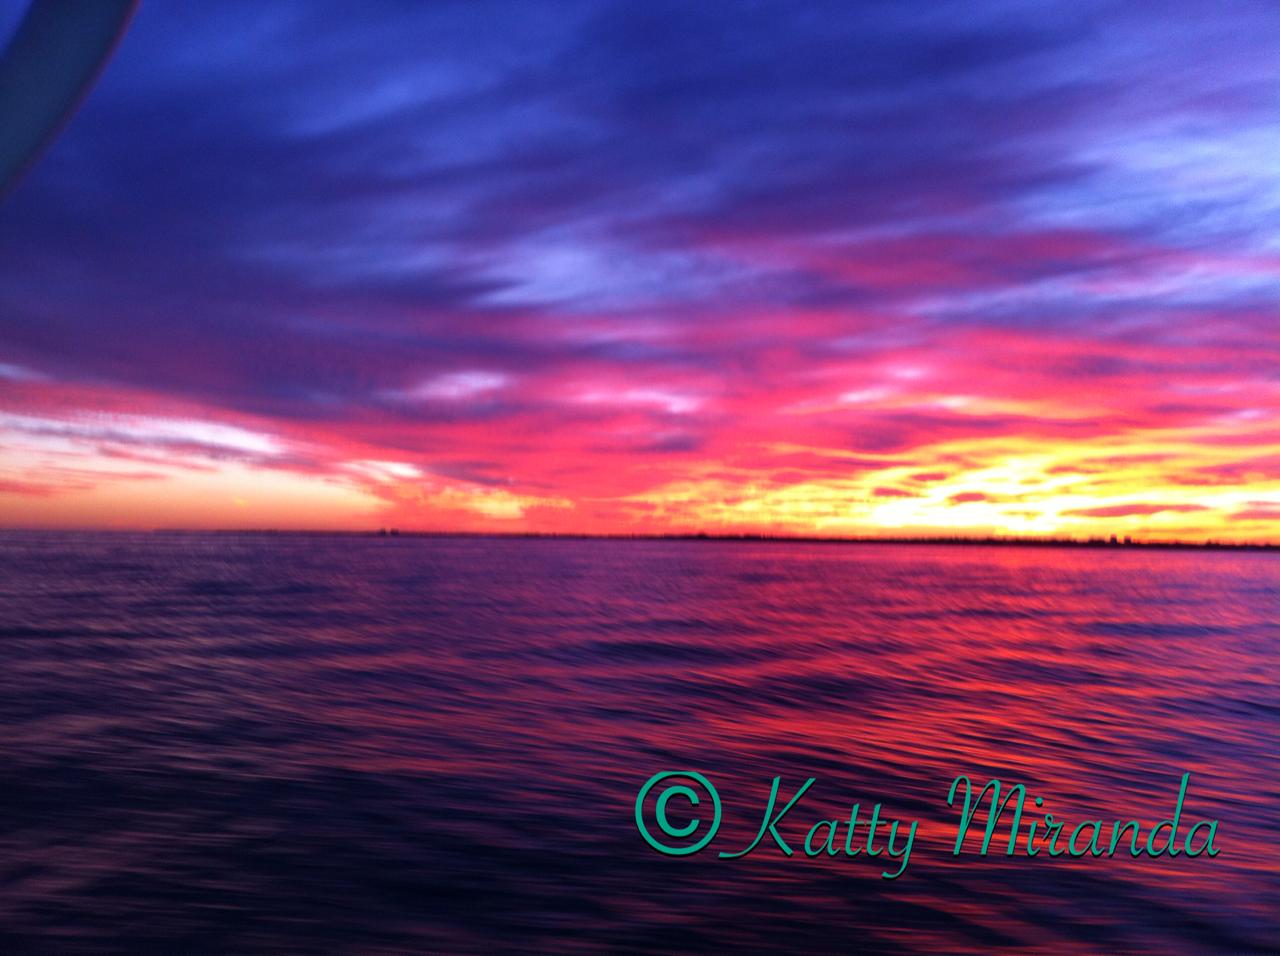 Amazing Sunset over the Biscayne Bay Miami, FL- Photo by: Katty Miranda